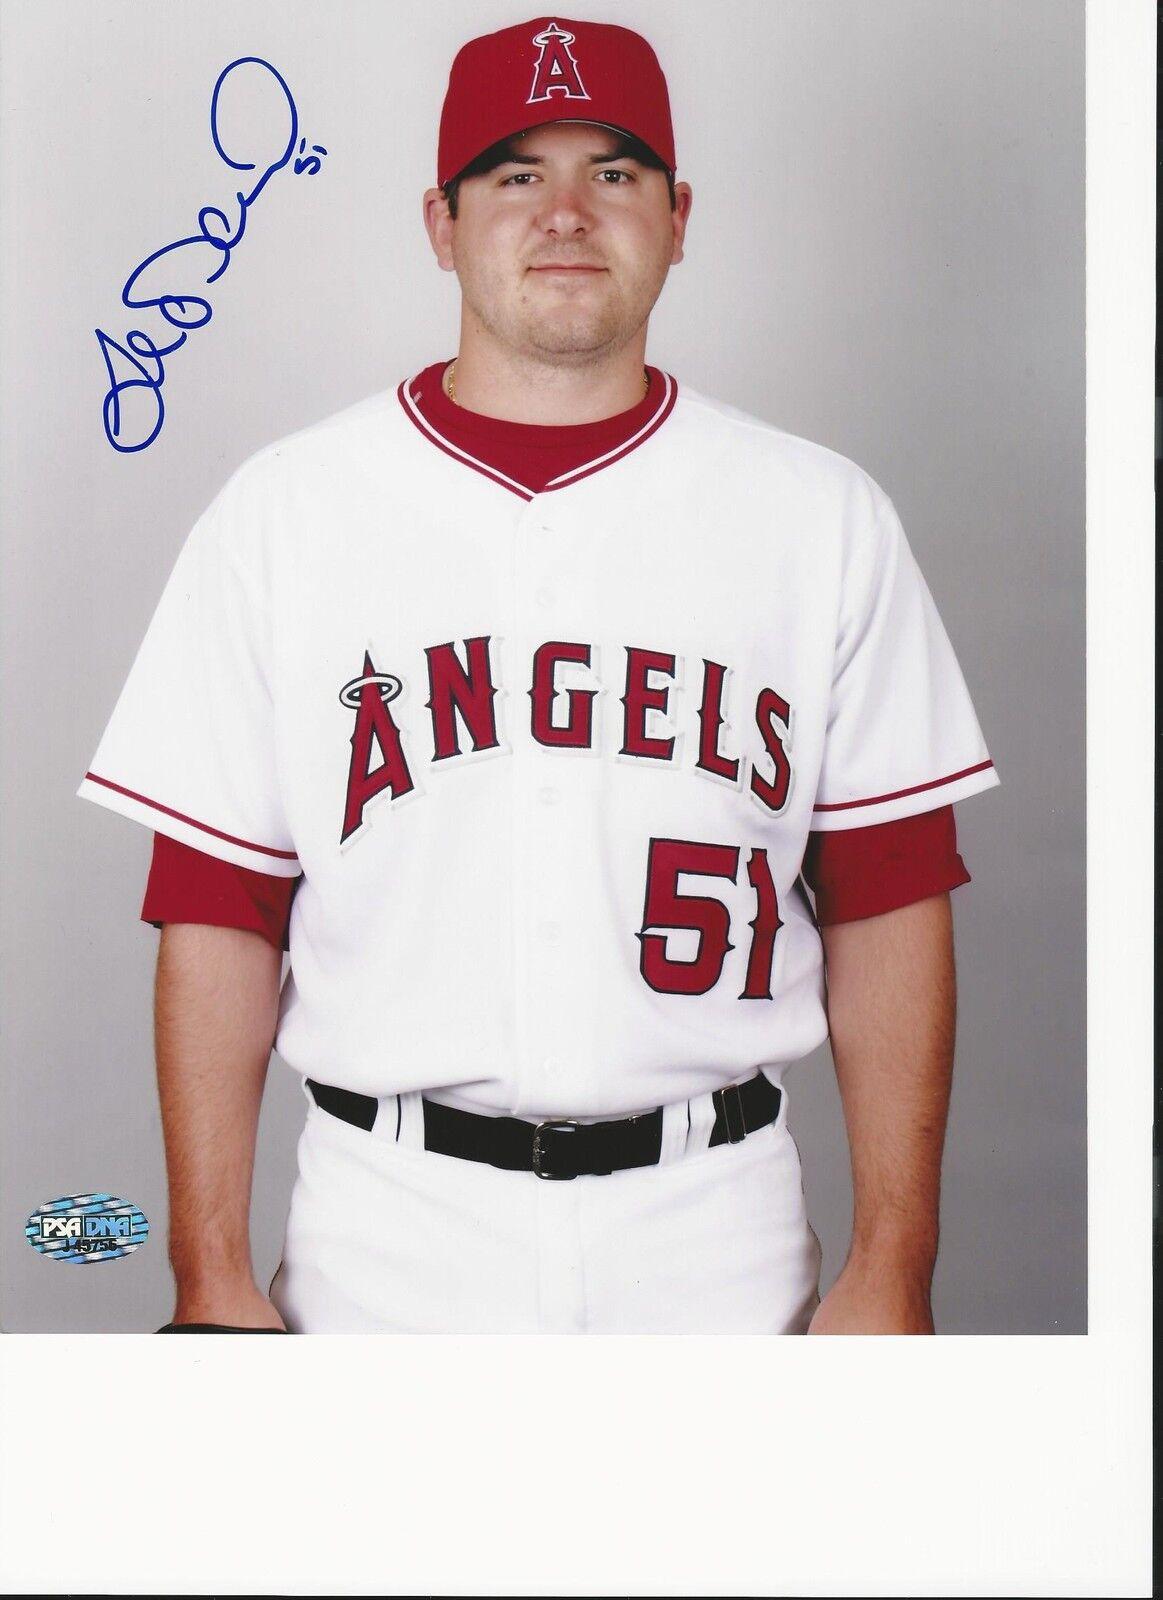 Anaheim Angels Joe Saunders Signed 8x10 Photo PSA/DNA # J45756